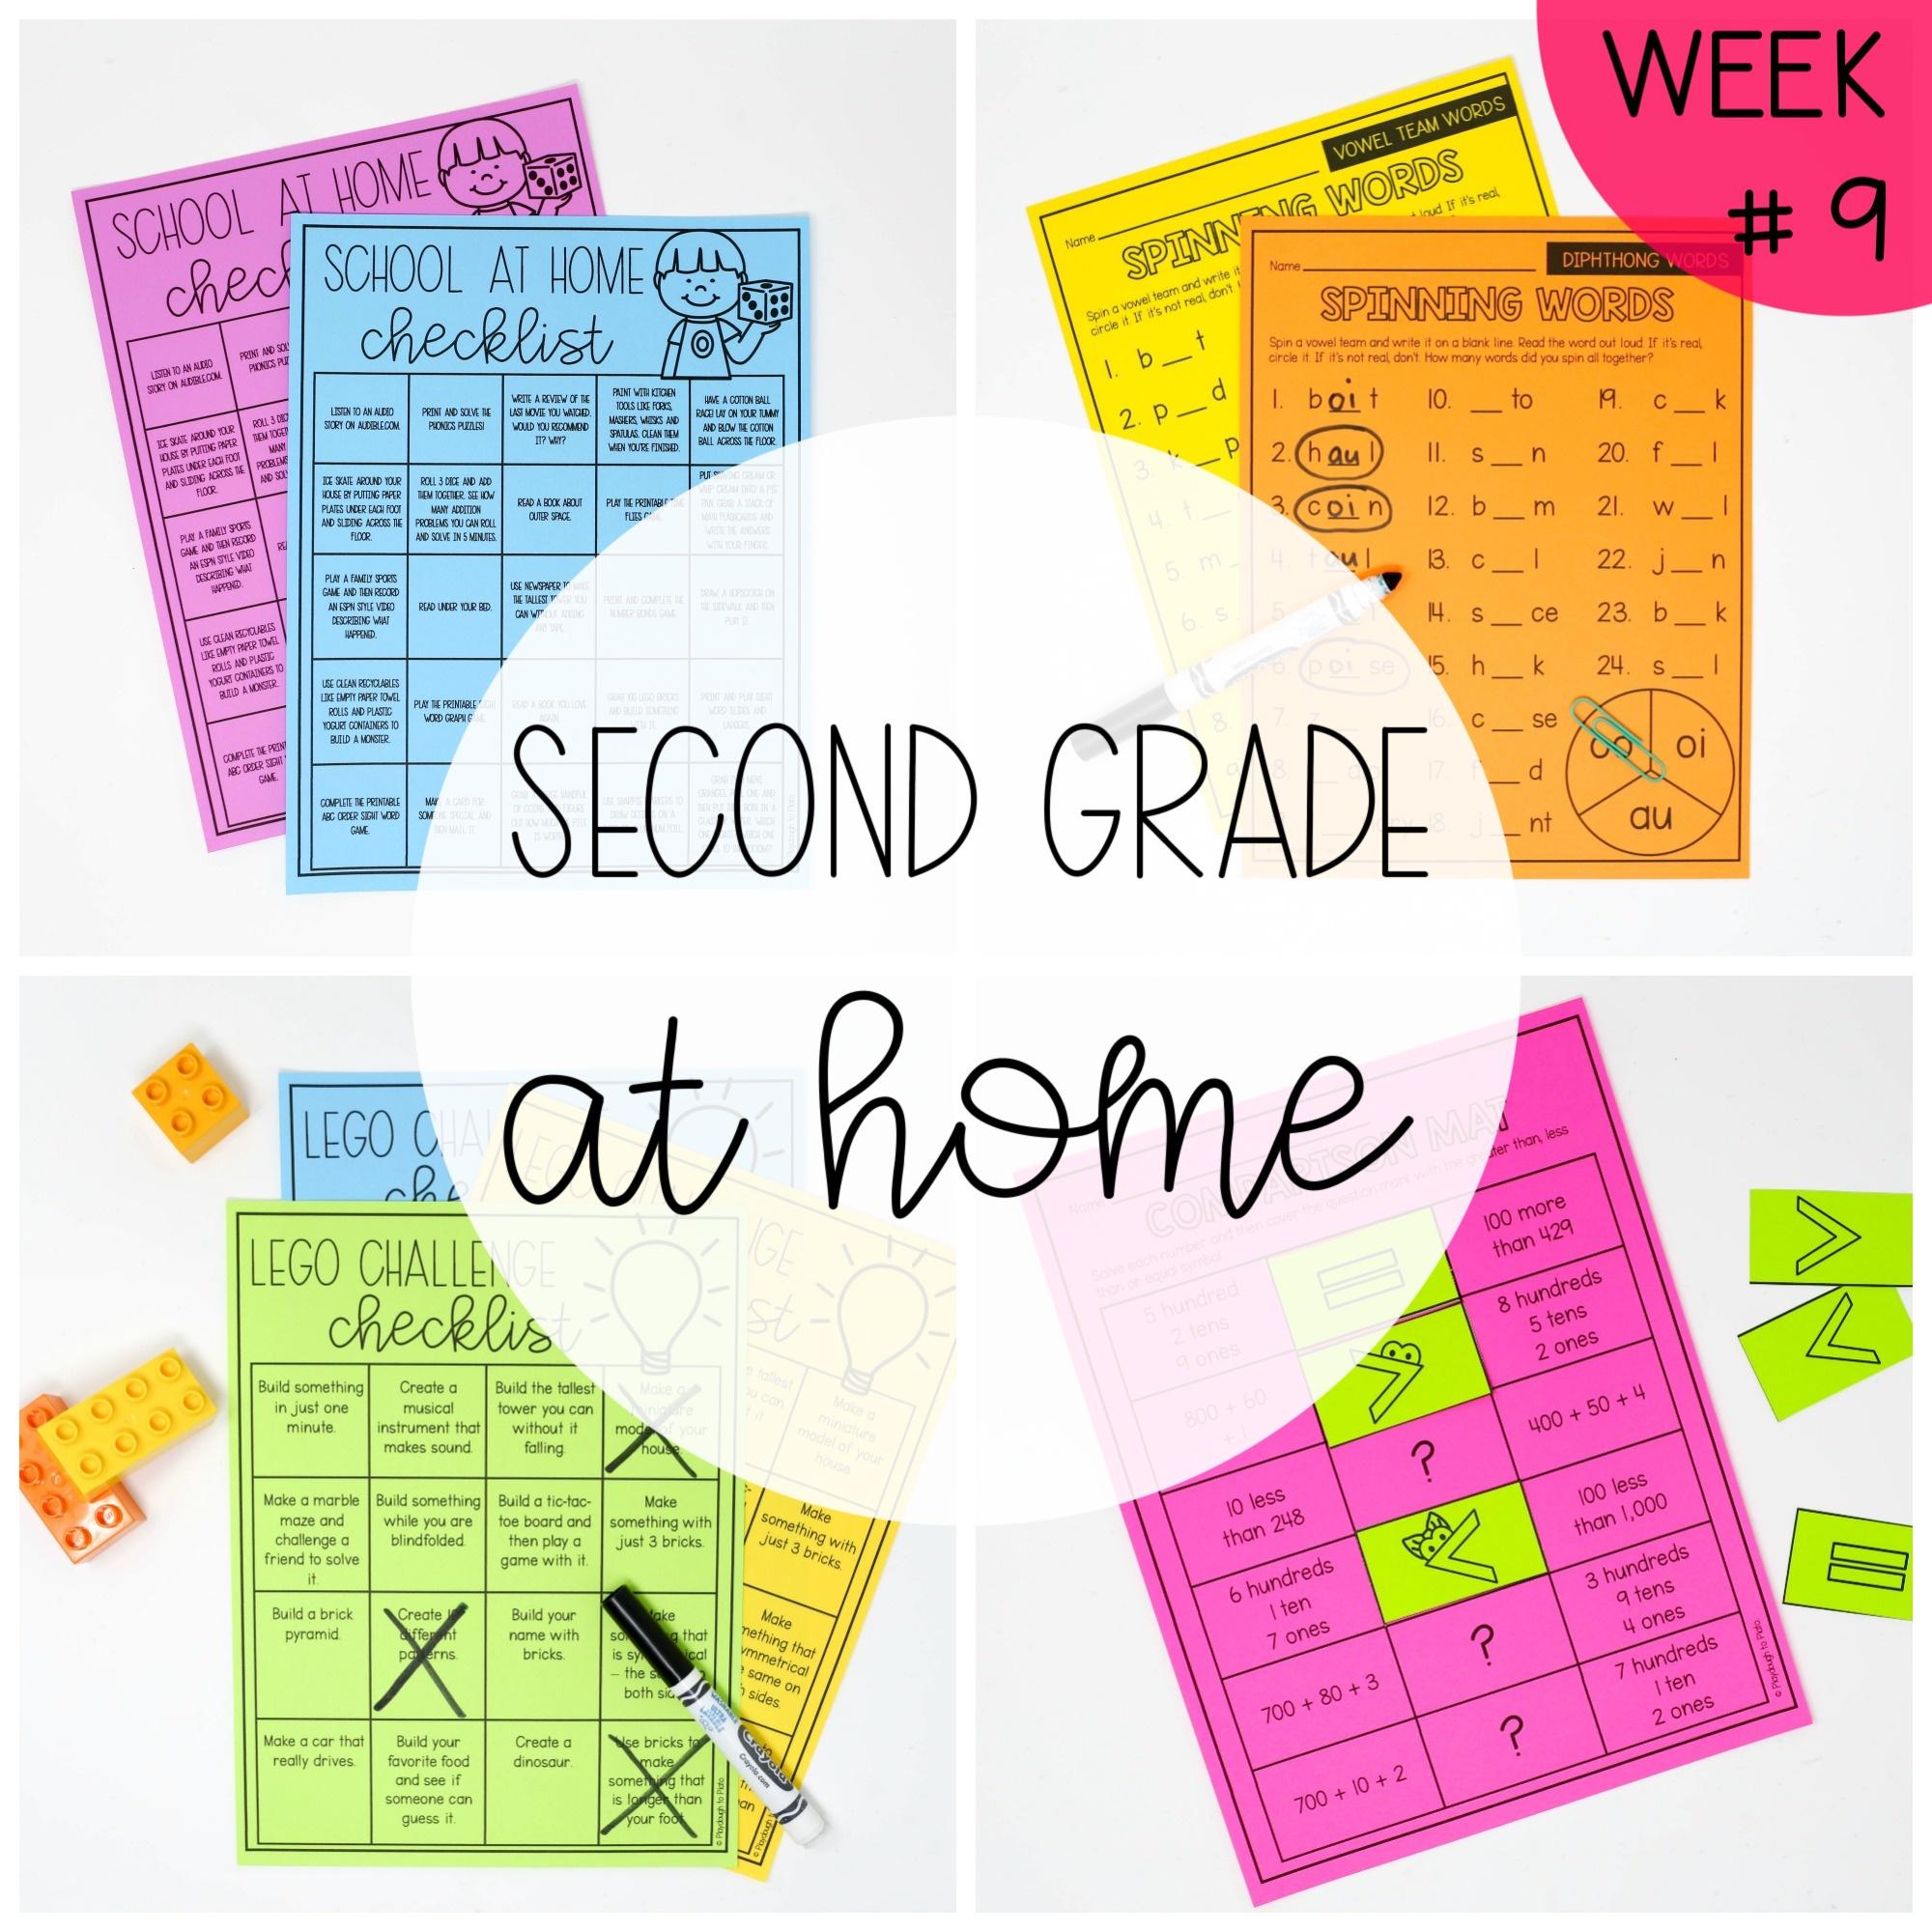 Second Grade at Home – Week Nine